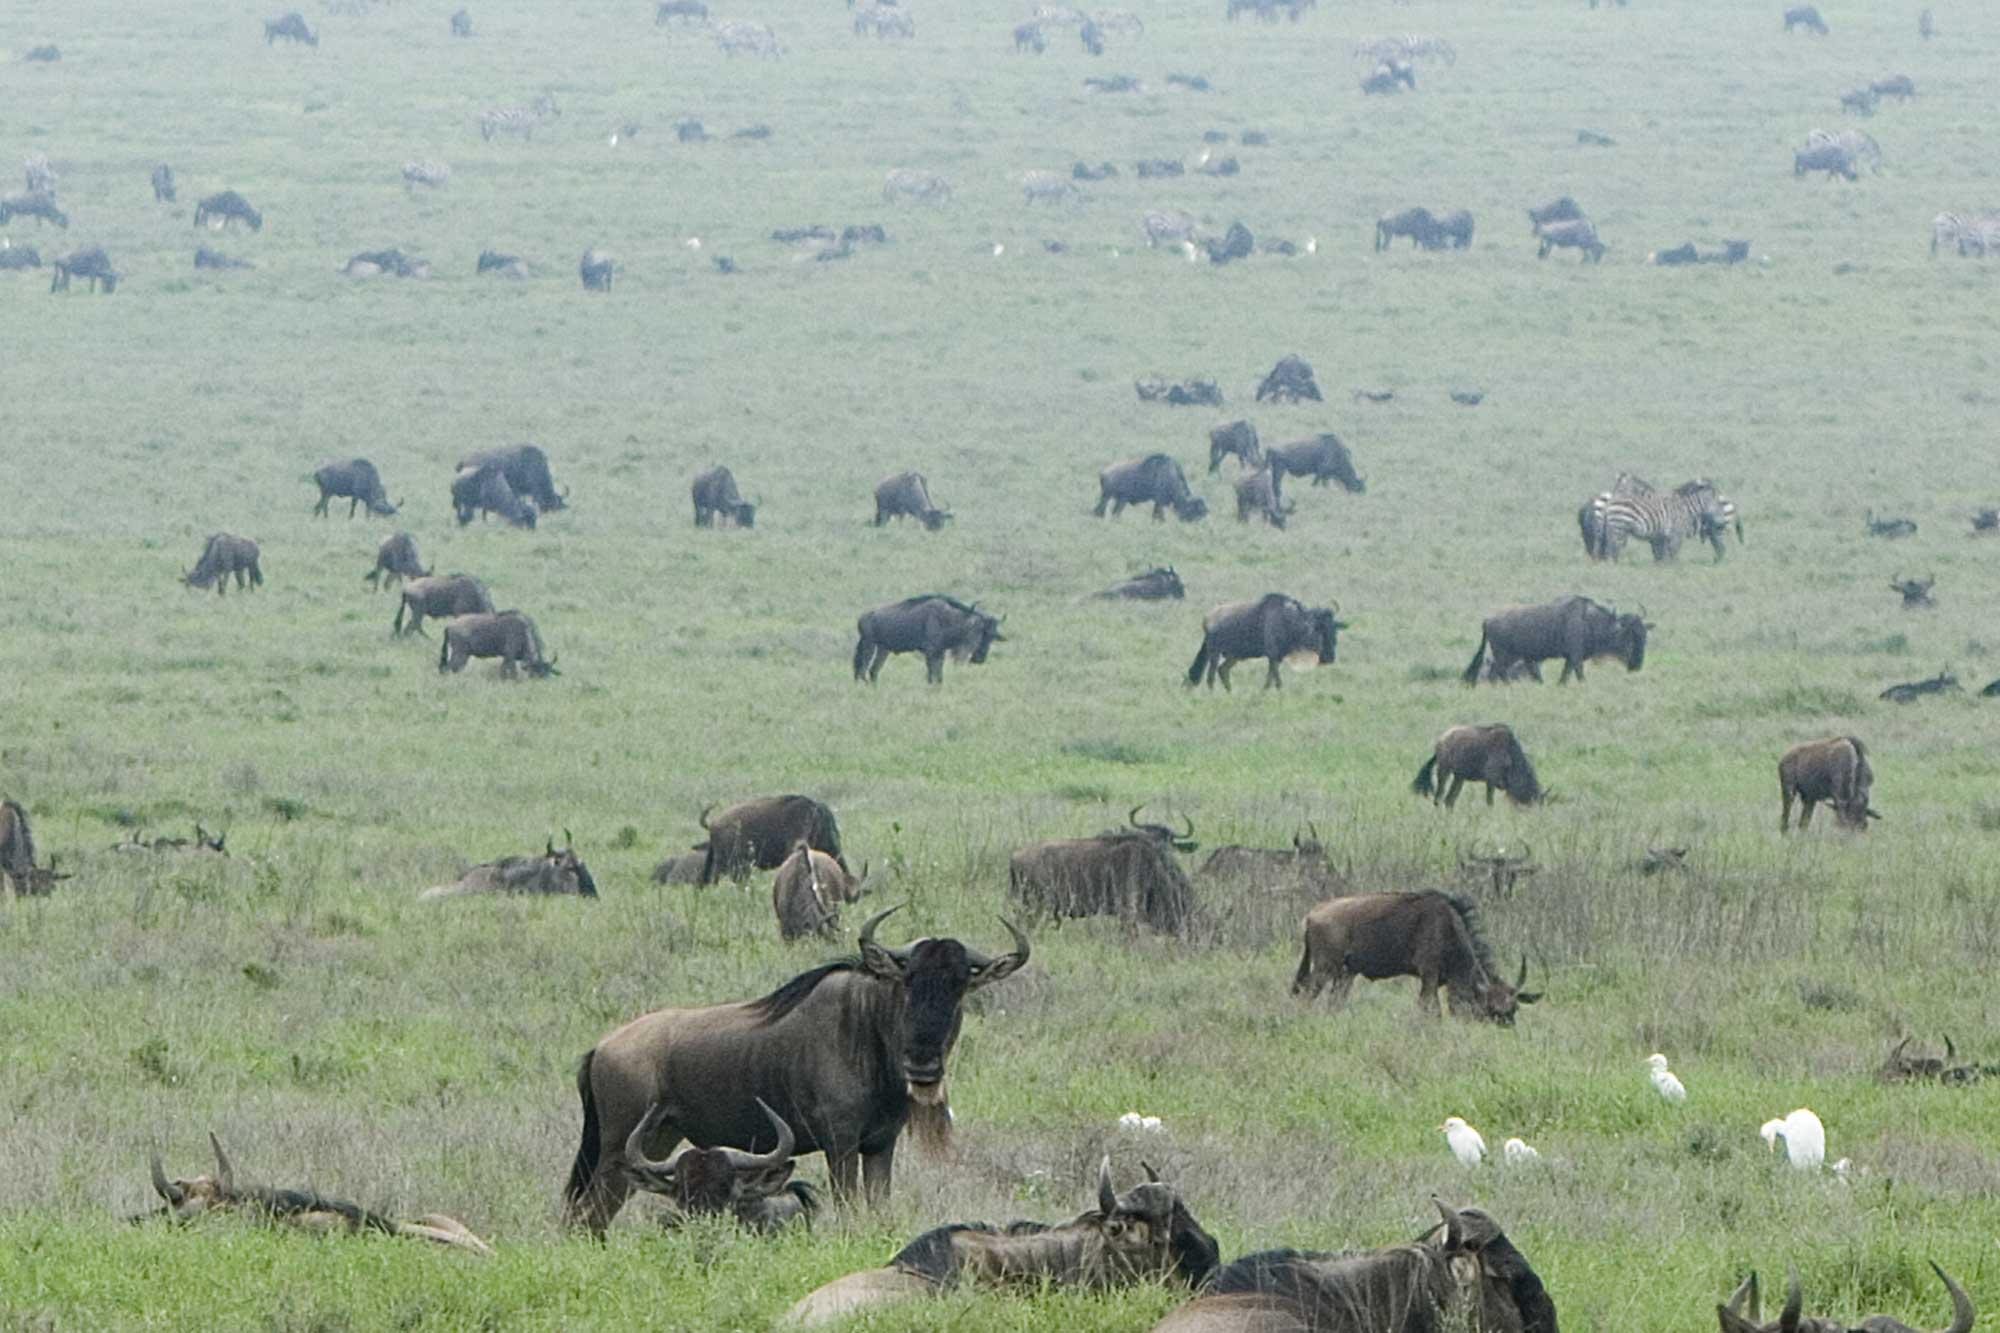 Tanzania: Serengeti Great Migration Safari